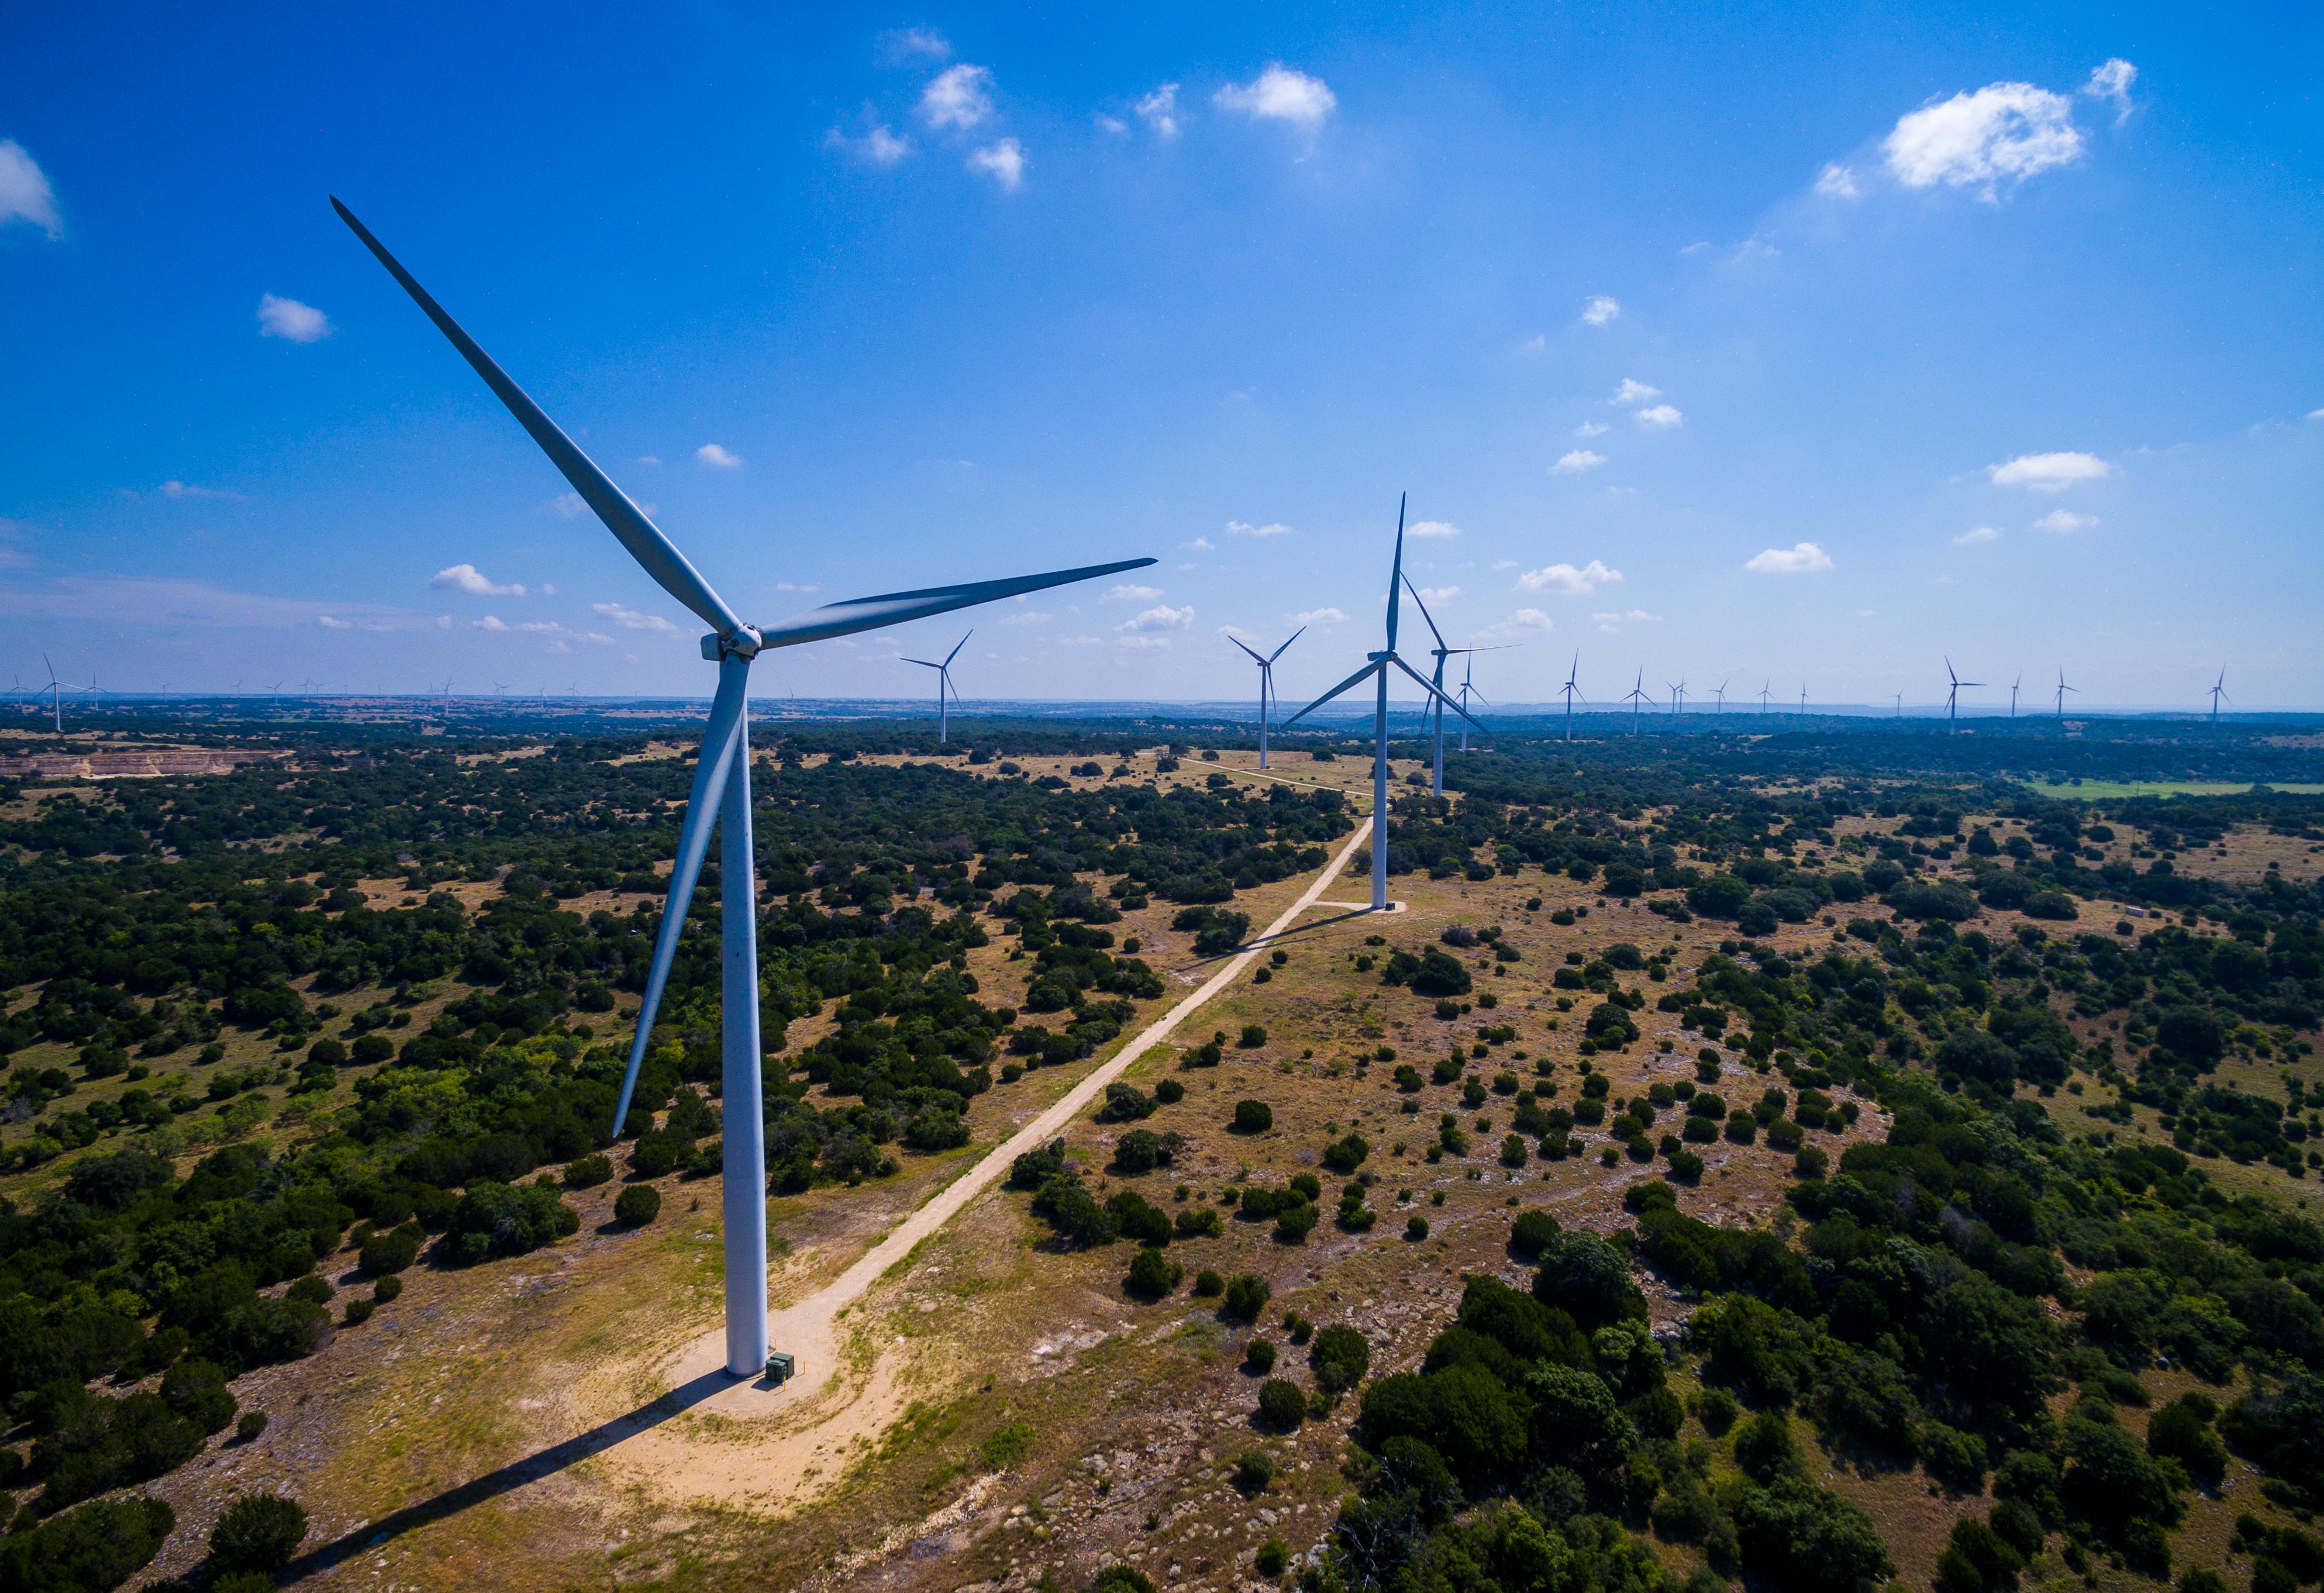 Wind turbines in Texas. Credit: iStock